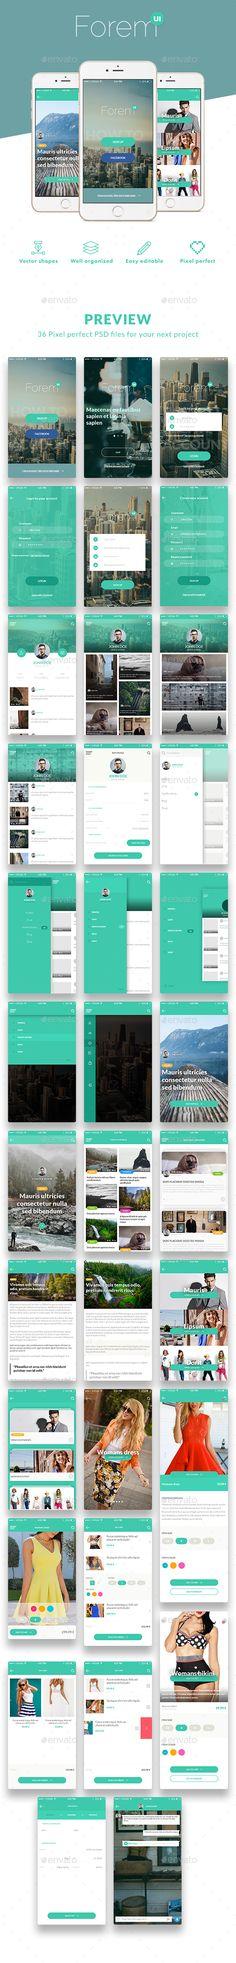 Forem UI Kit Template PSD. Download here: http://graphicriver.net/item/foremui-kit/15841094?ref=ksioks